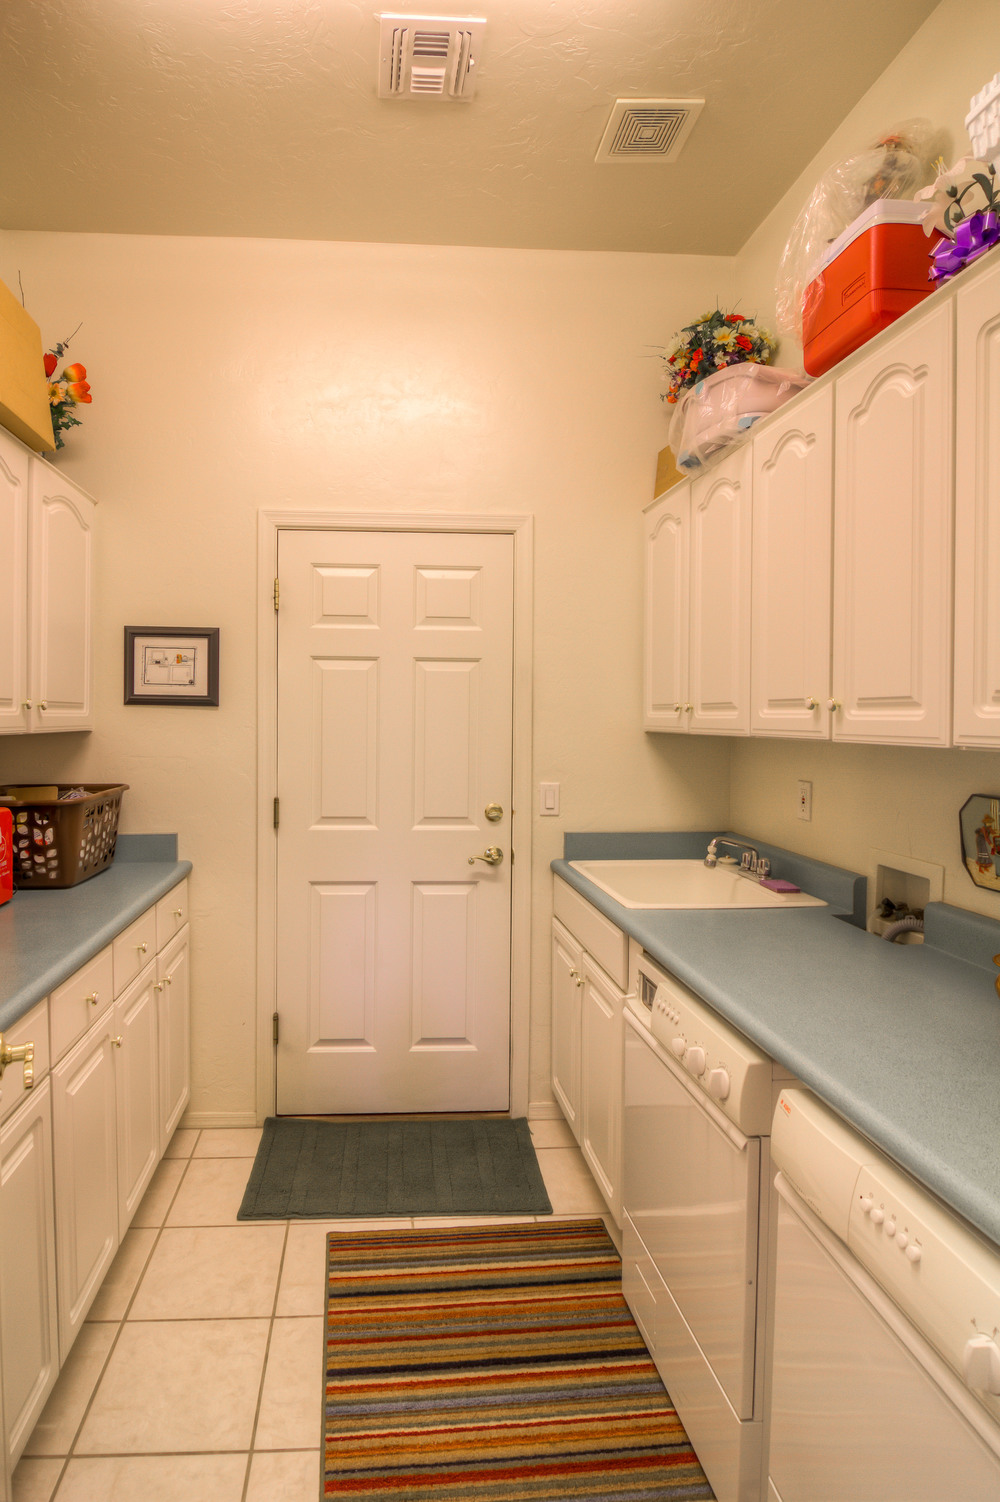 7 Laundry Room.jpg